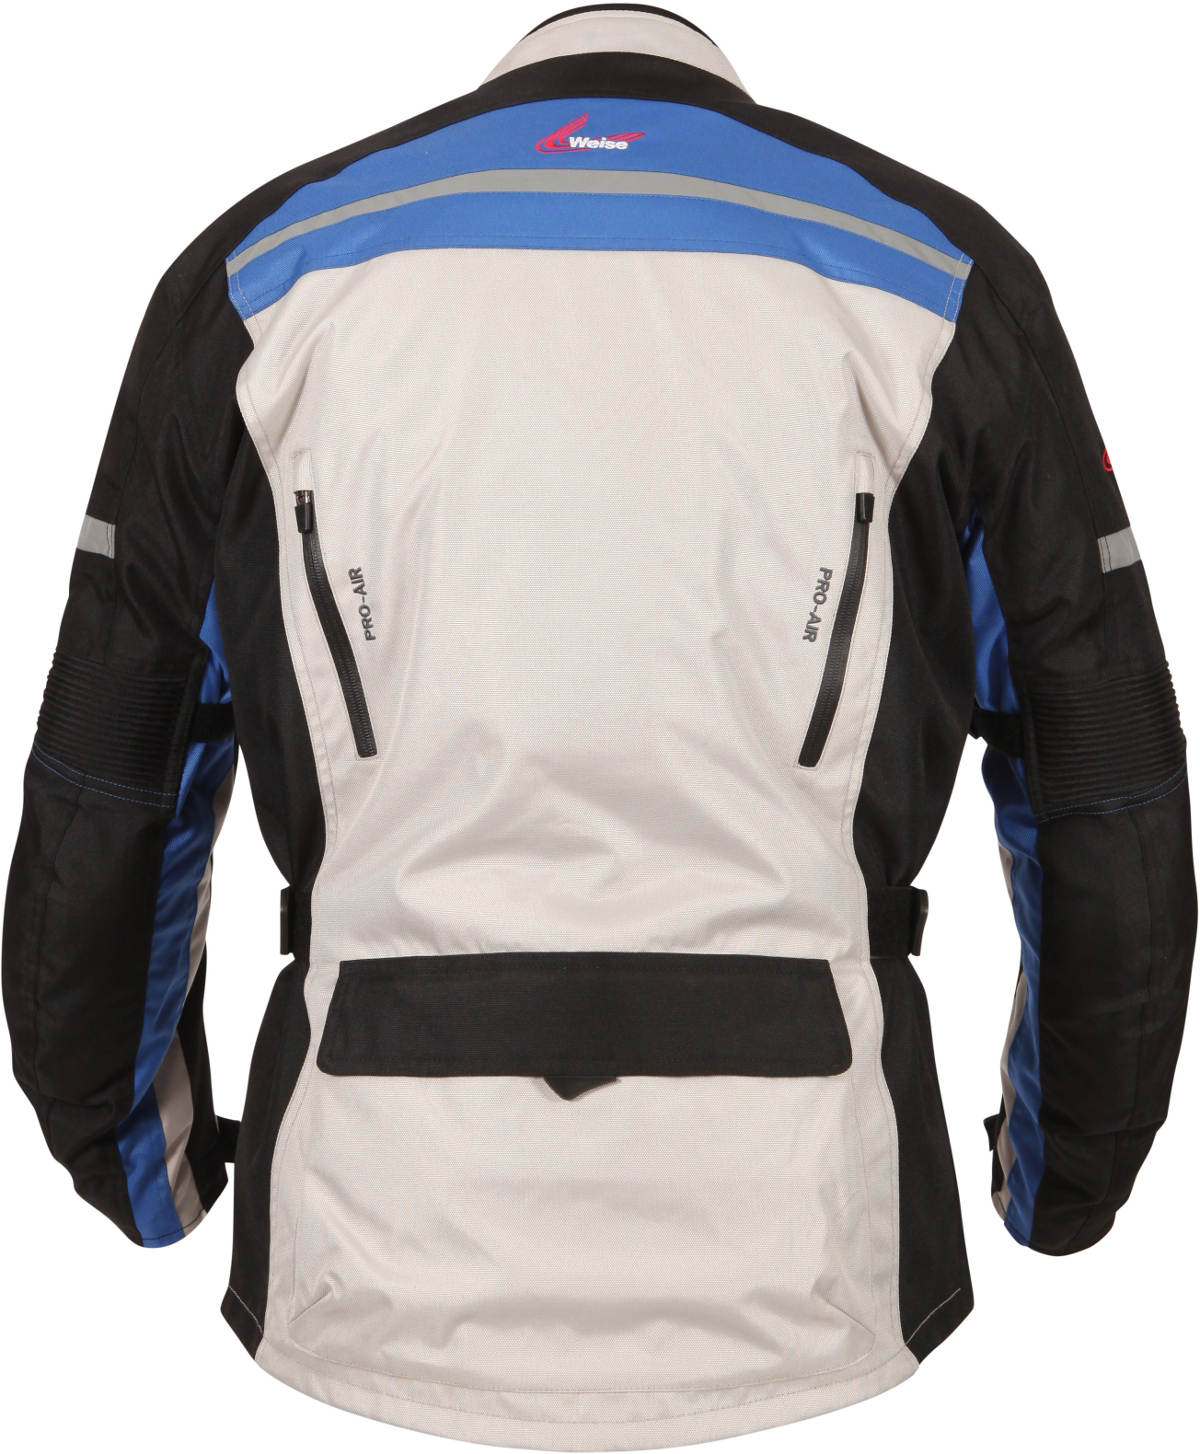 Weise Stuttgart textile Motorcycle Jacket Back Stone Blue